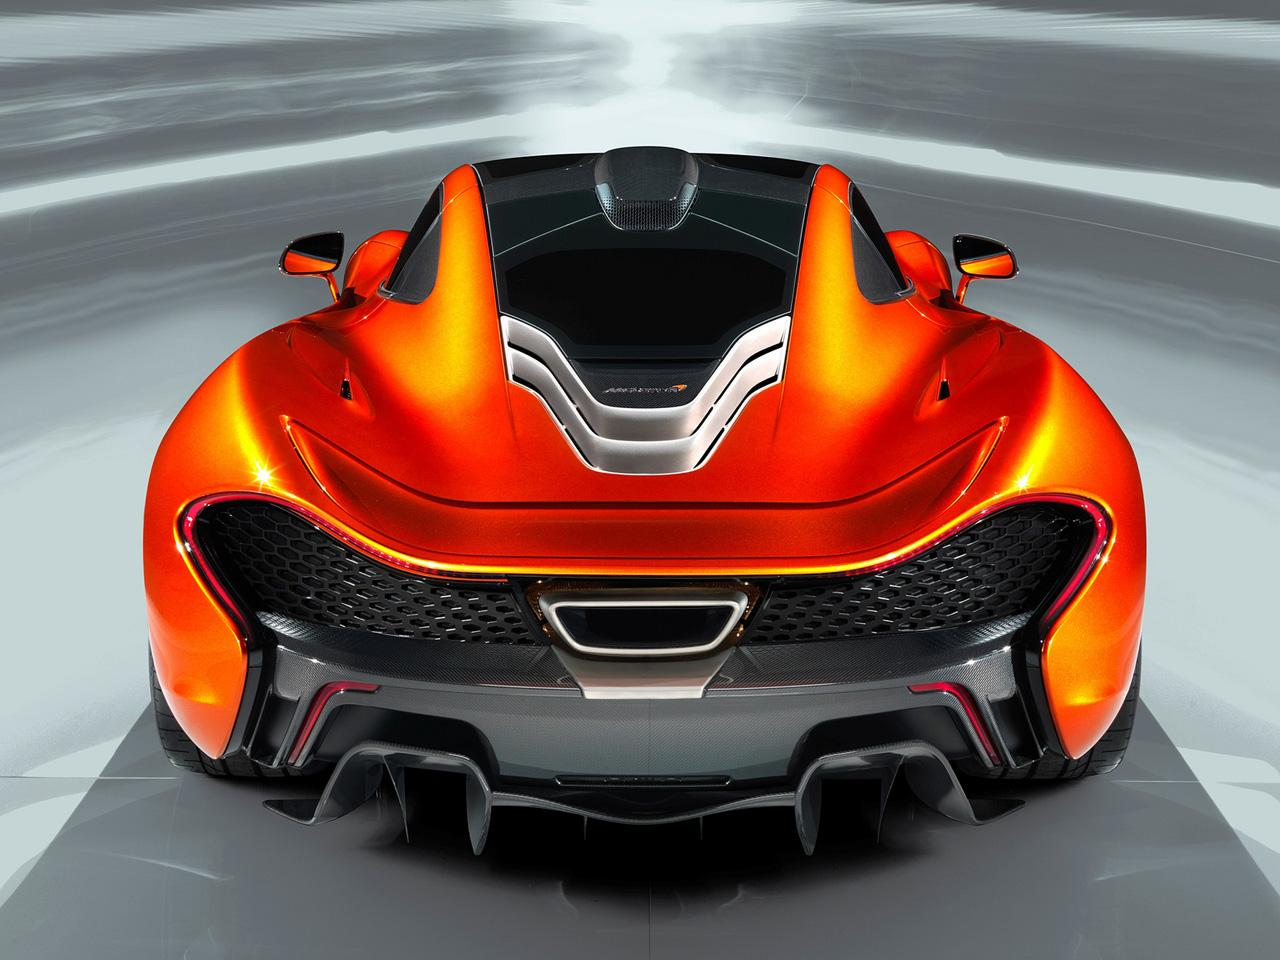 McLaren P1 Photo Gallery - Autoblog